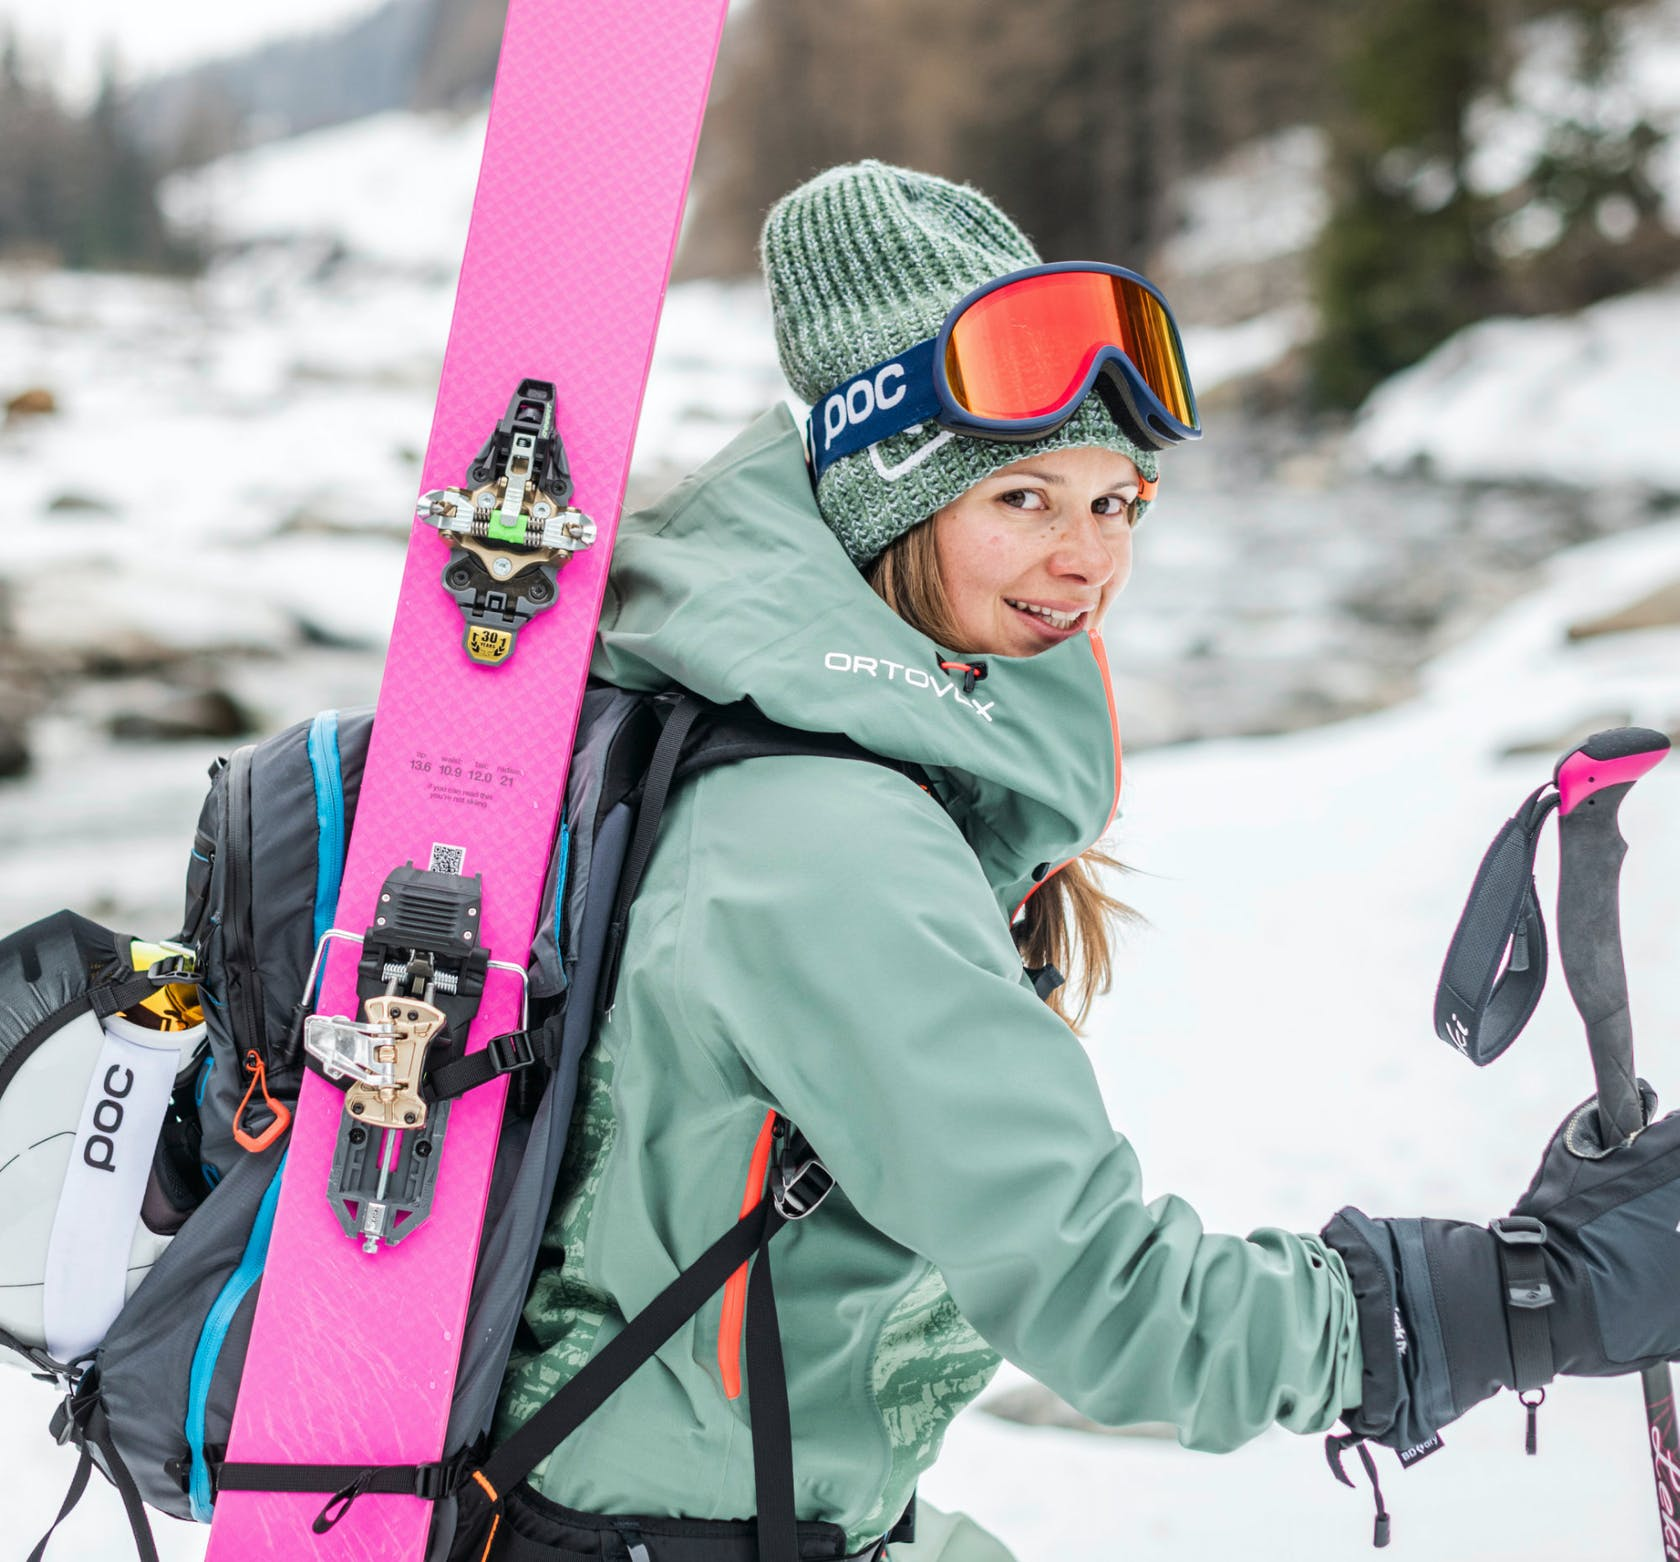 ortovox skitouring damen